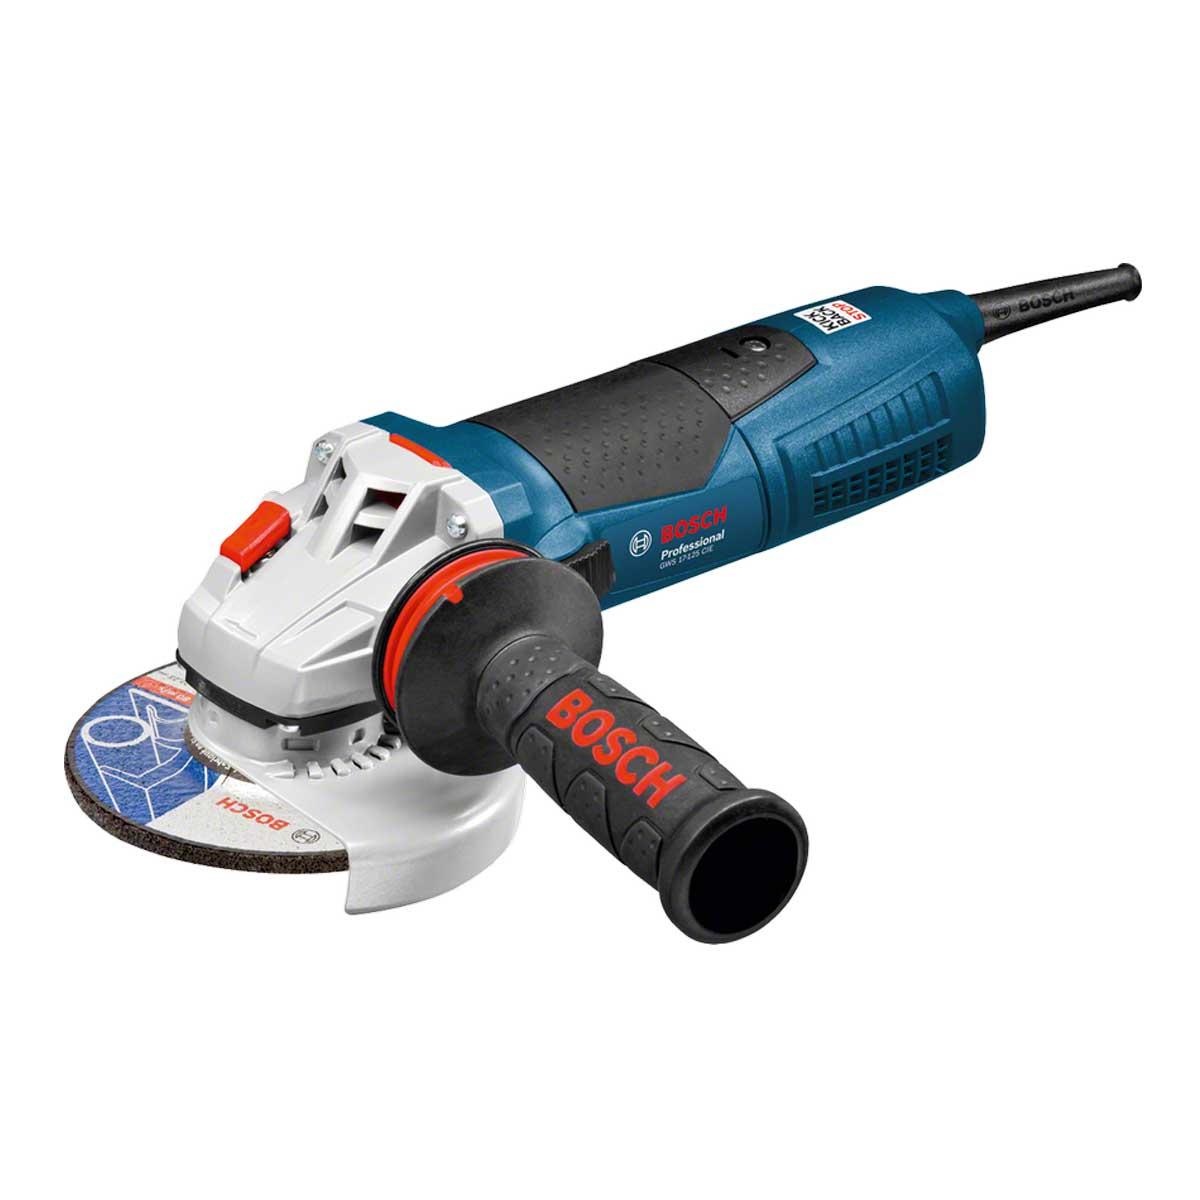 "Esmerilhadeira 5"" Gws 17-125 Inox C/ Controle Velocidade - Bosch"